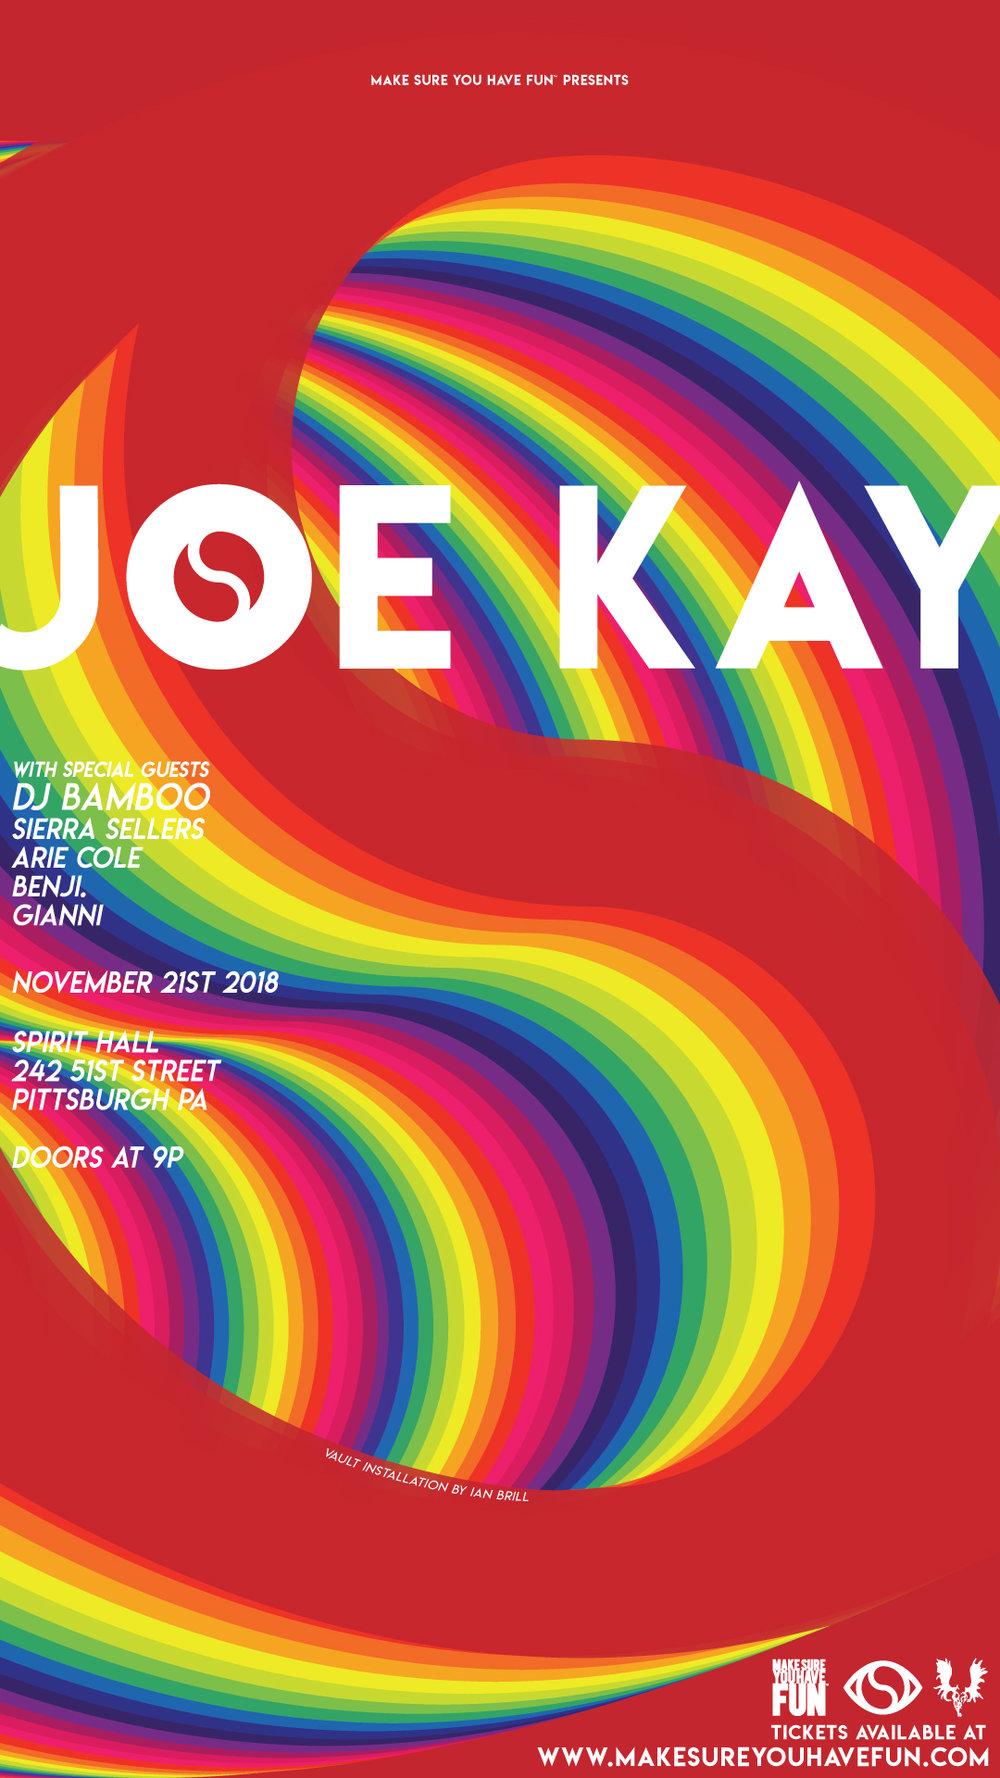 Joe-Kay-Flyer-IG-Story.jpg